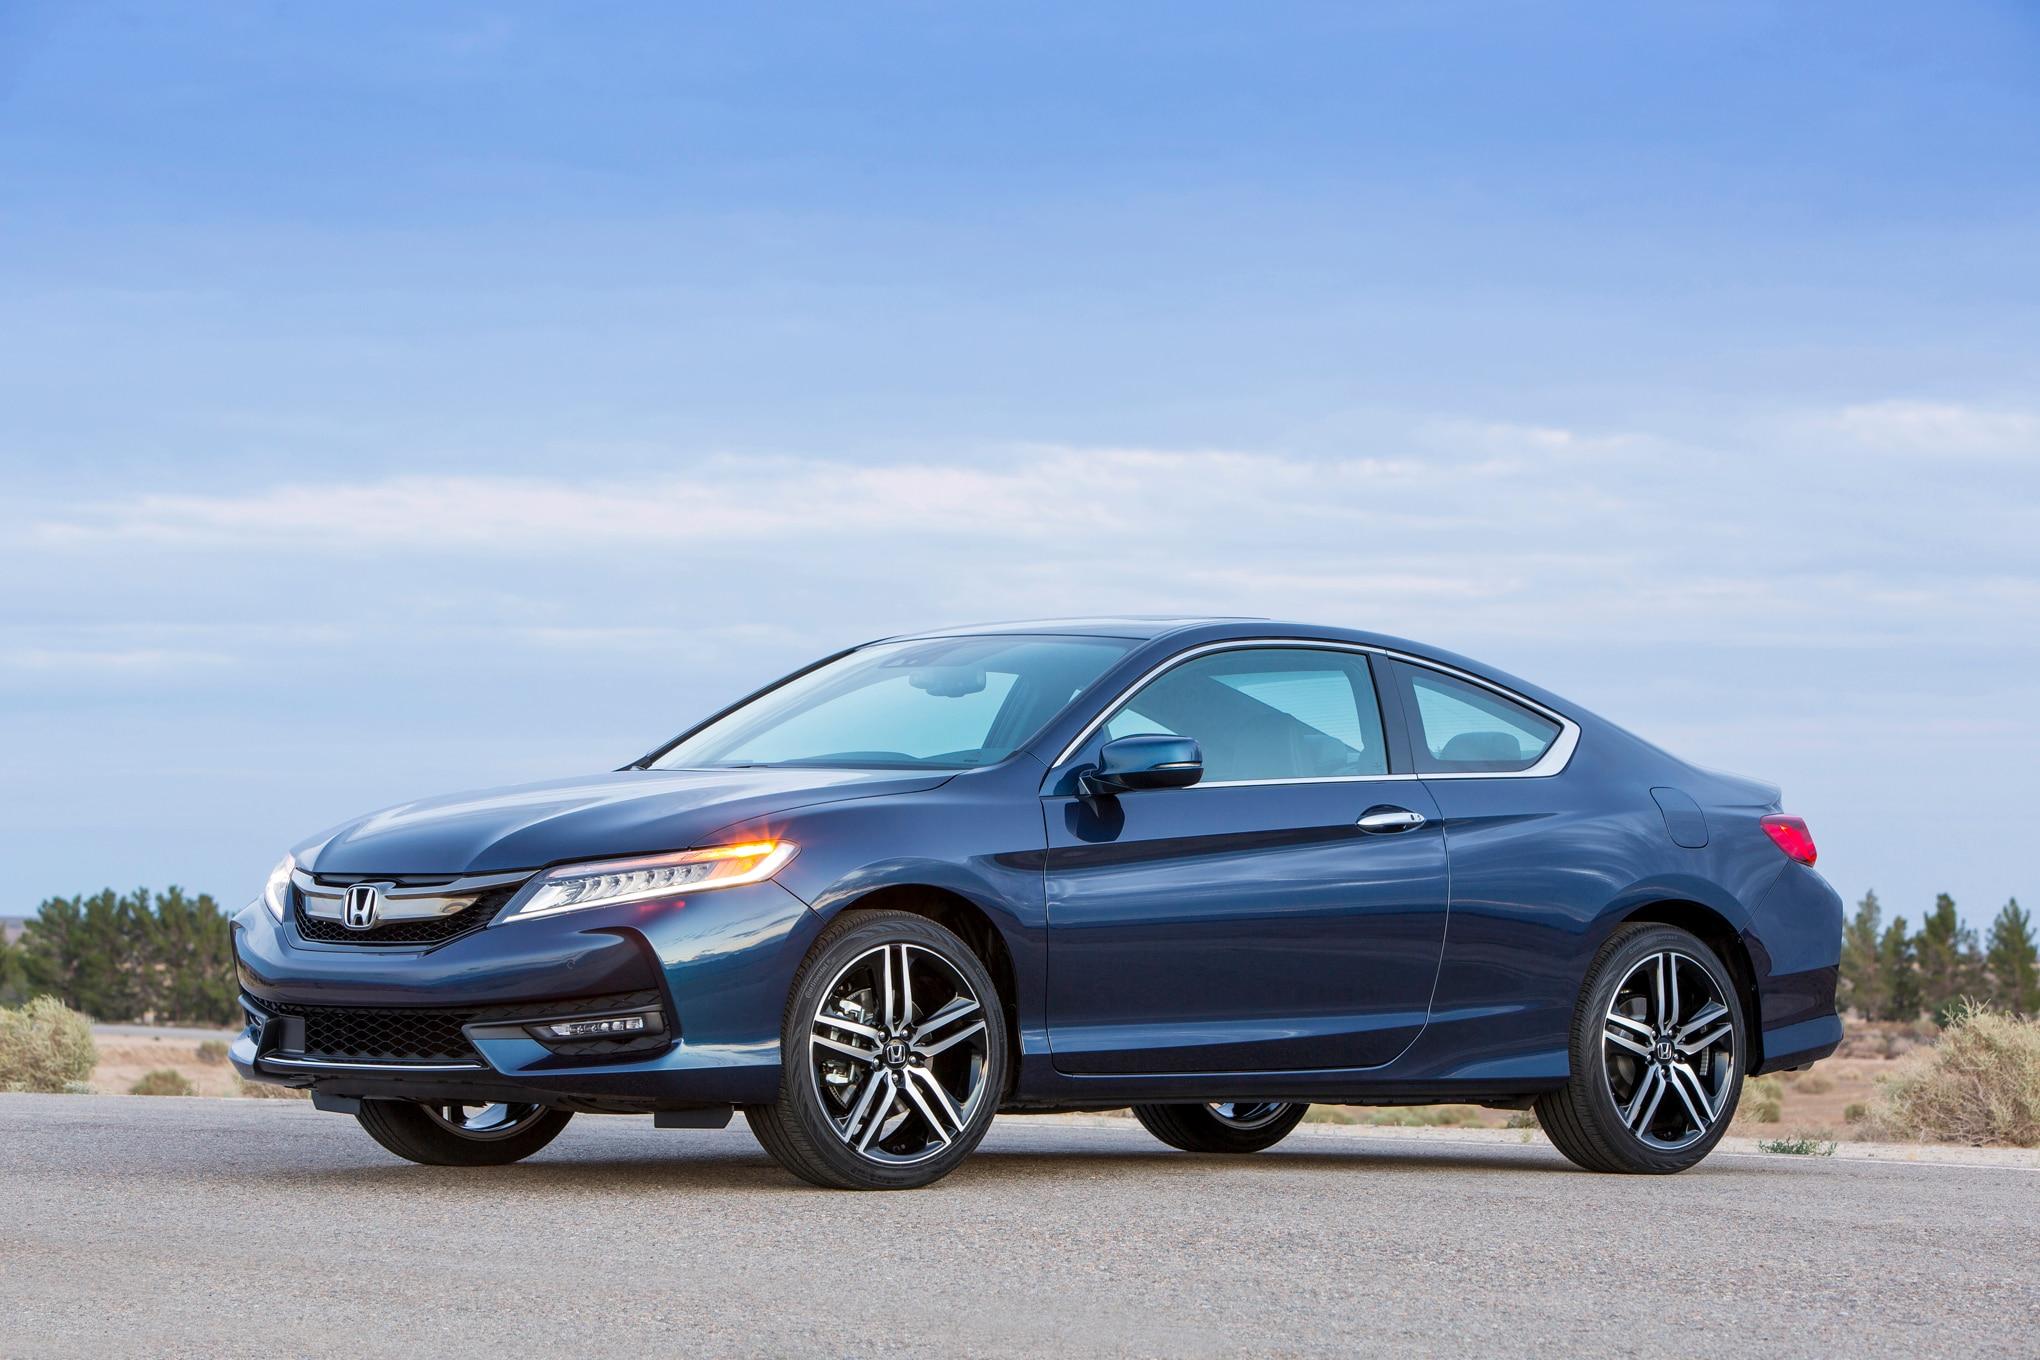 2016 Honda Accord Named IIHS Top Safety Pick+